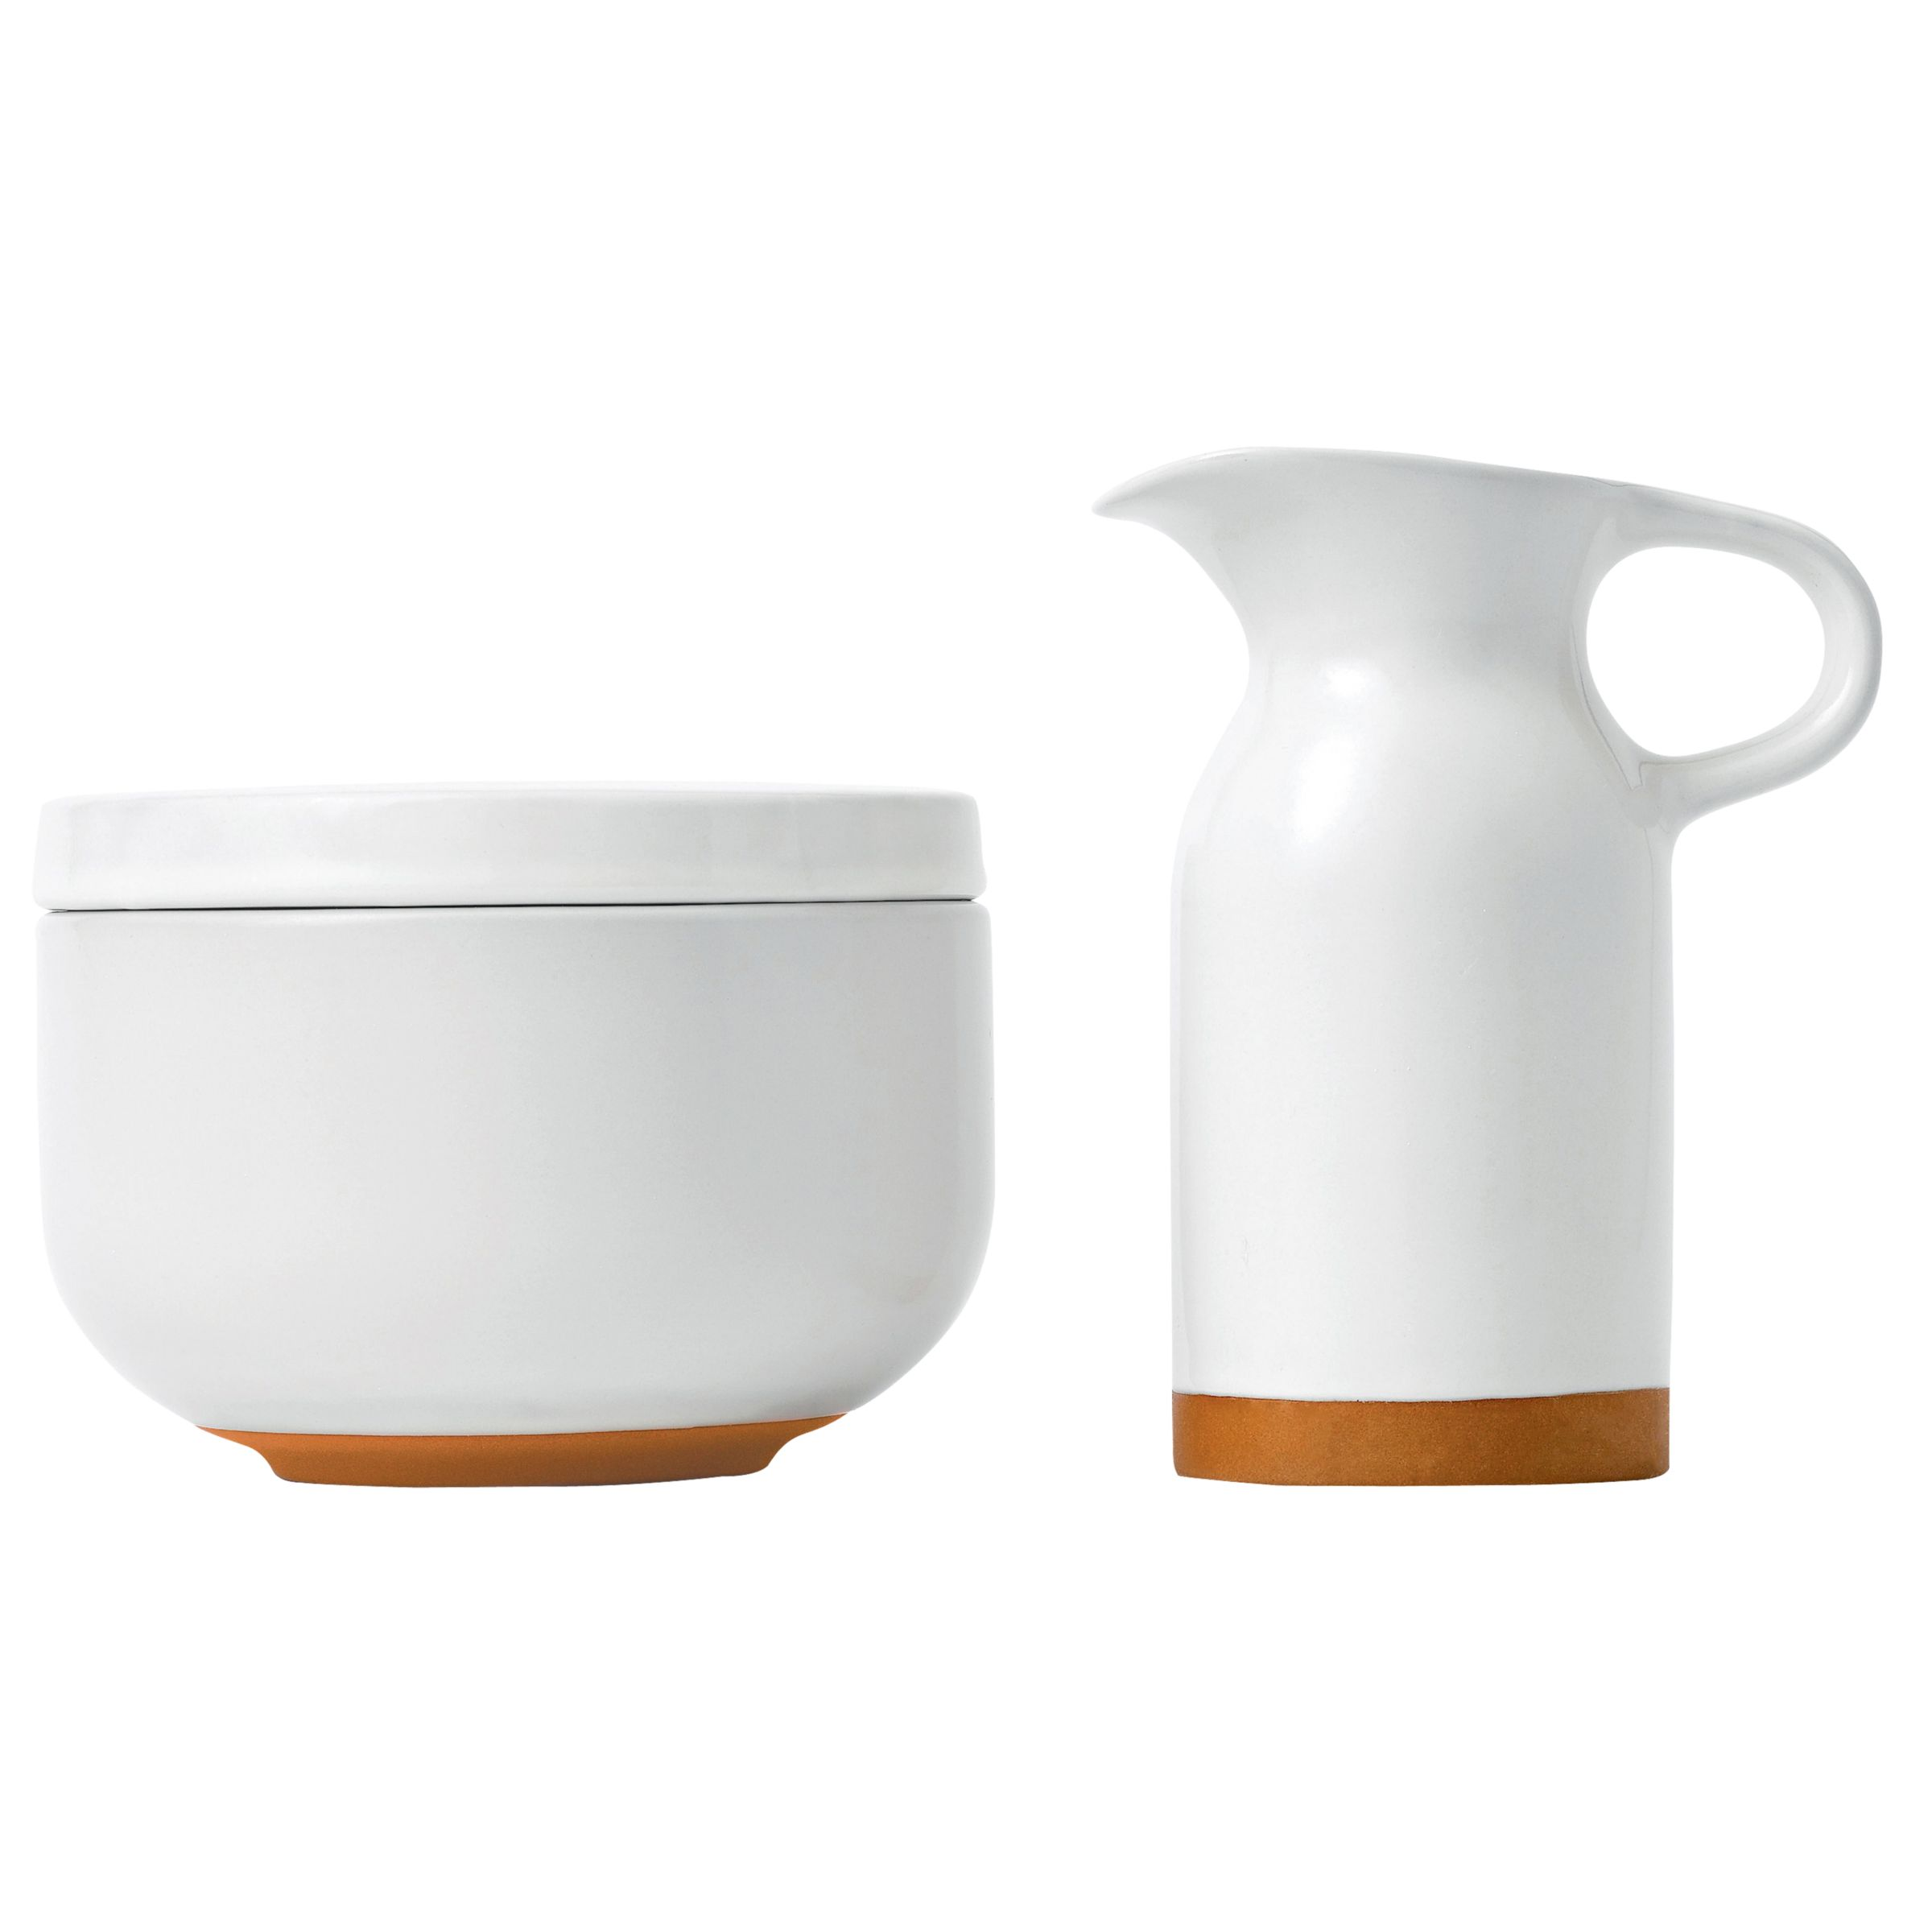 Royal Doulton Royal Doulton Olio Sugar Bowl & Milk / Cream Jug